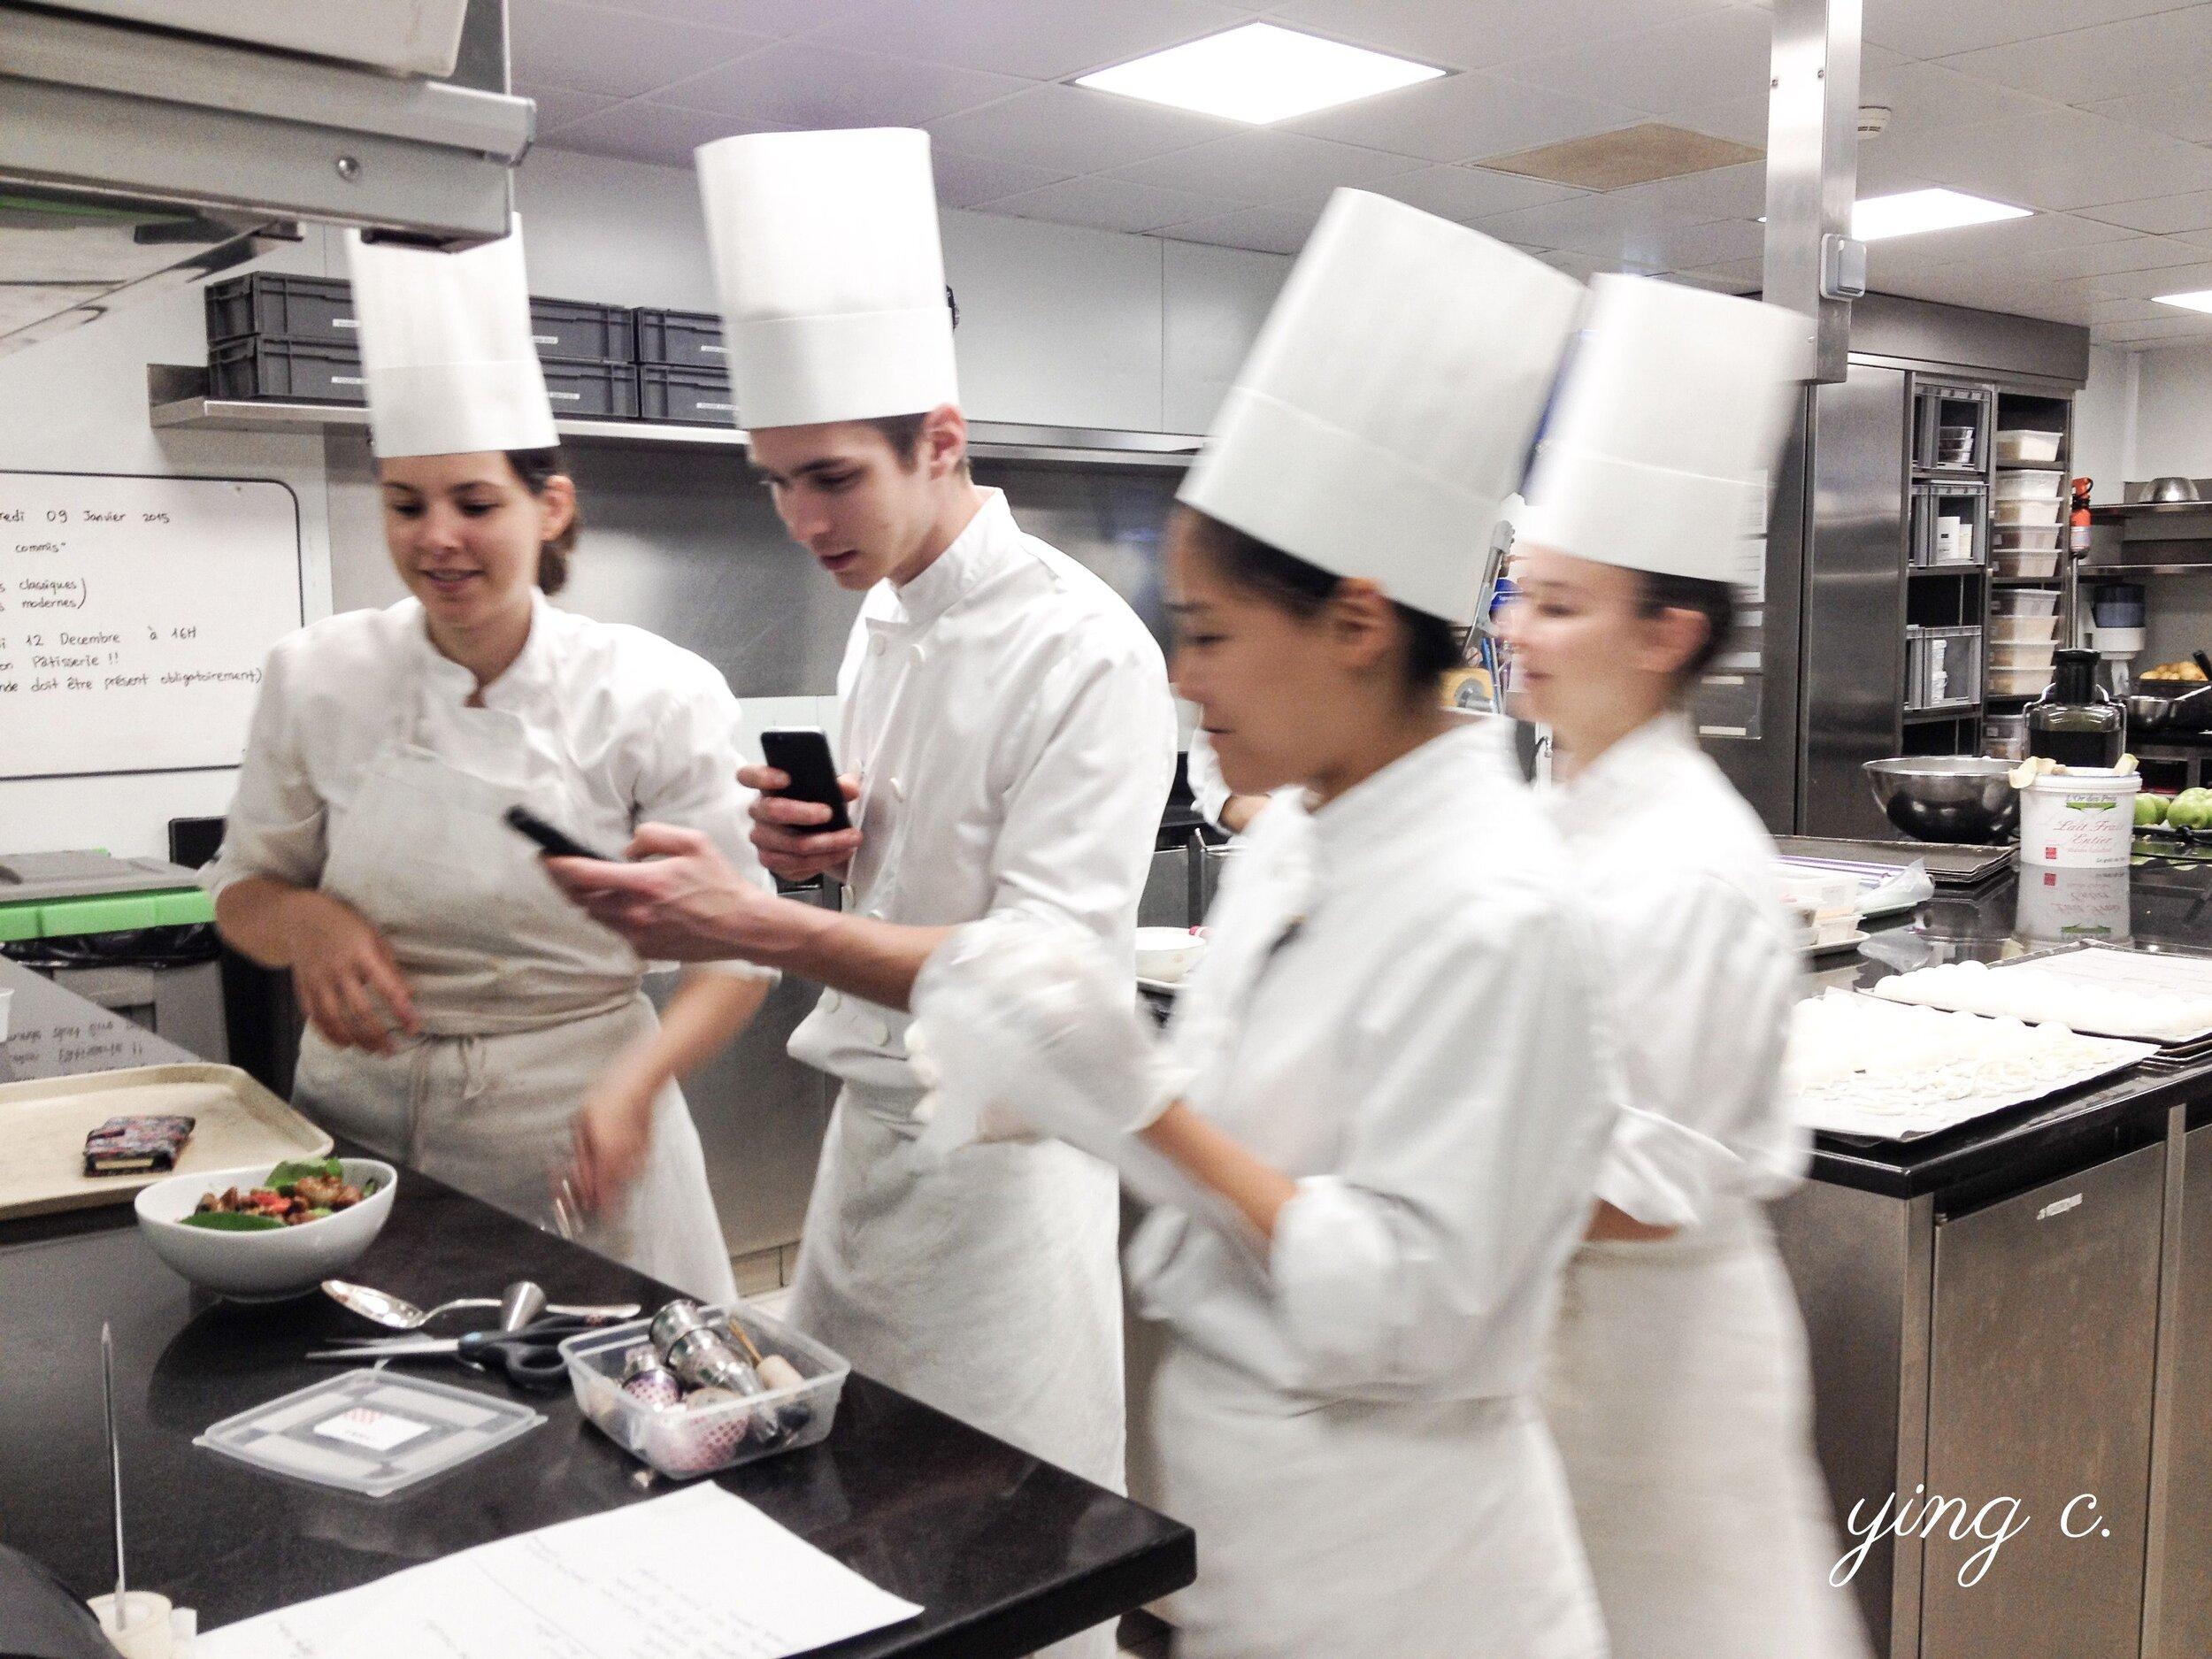 Le Meurice 甜點廚房的團隊成員午餐時間。照片中是當時「Dali」小組的成員,包含小組長  Eunji (右前,現在已是紐約  Jungsik  餐廳的甜點主廚)、副小組長 Louise、甜點師 Quentin、實習生 Adrianna。